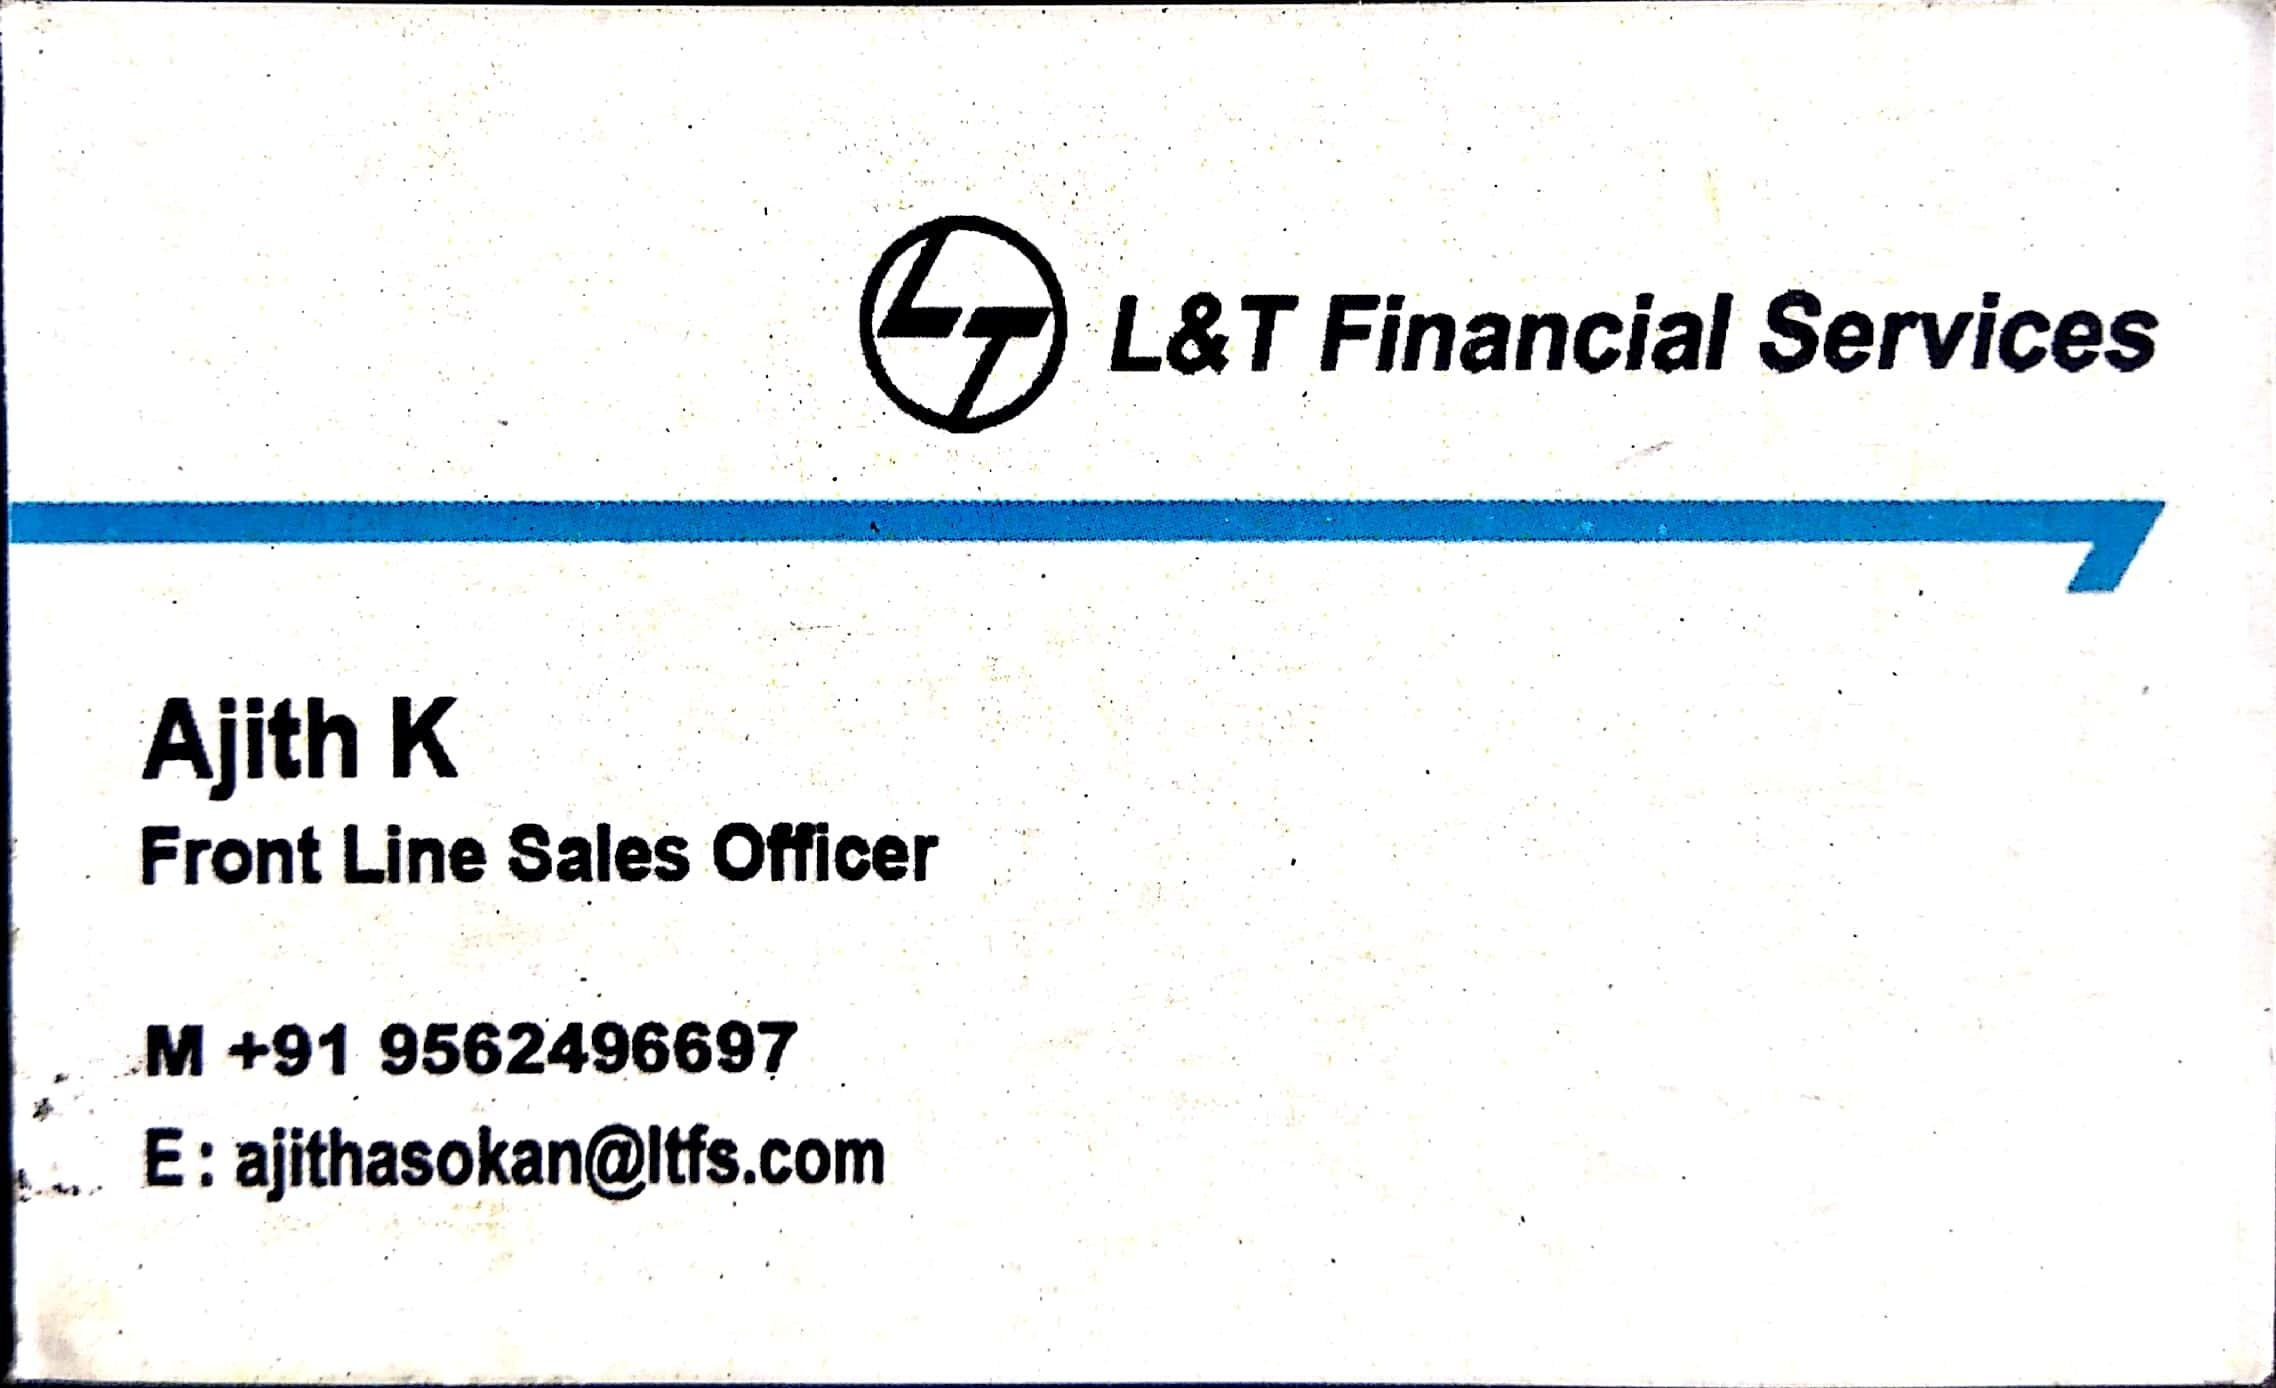 Ajith k, AUTO CONSULTANCY,  service in Ramanattukara, Kozhikode